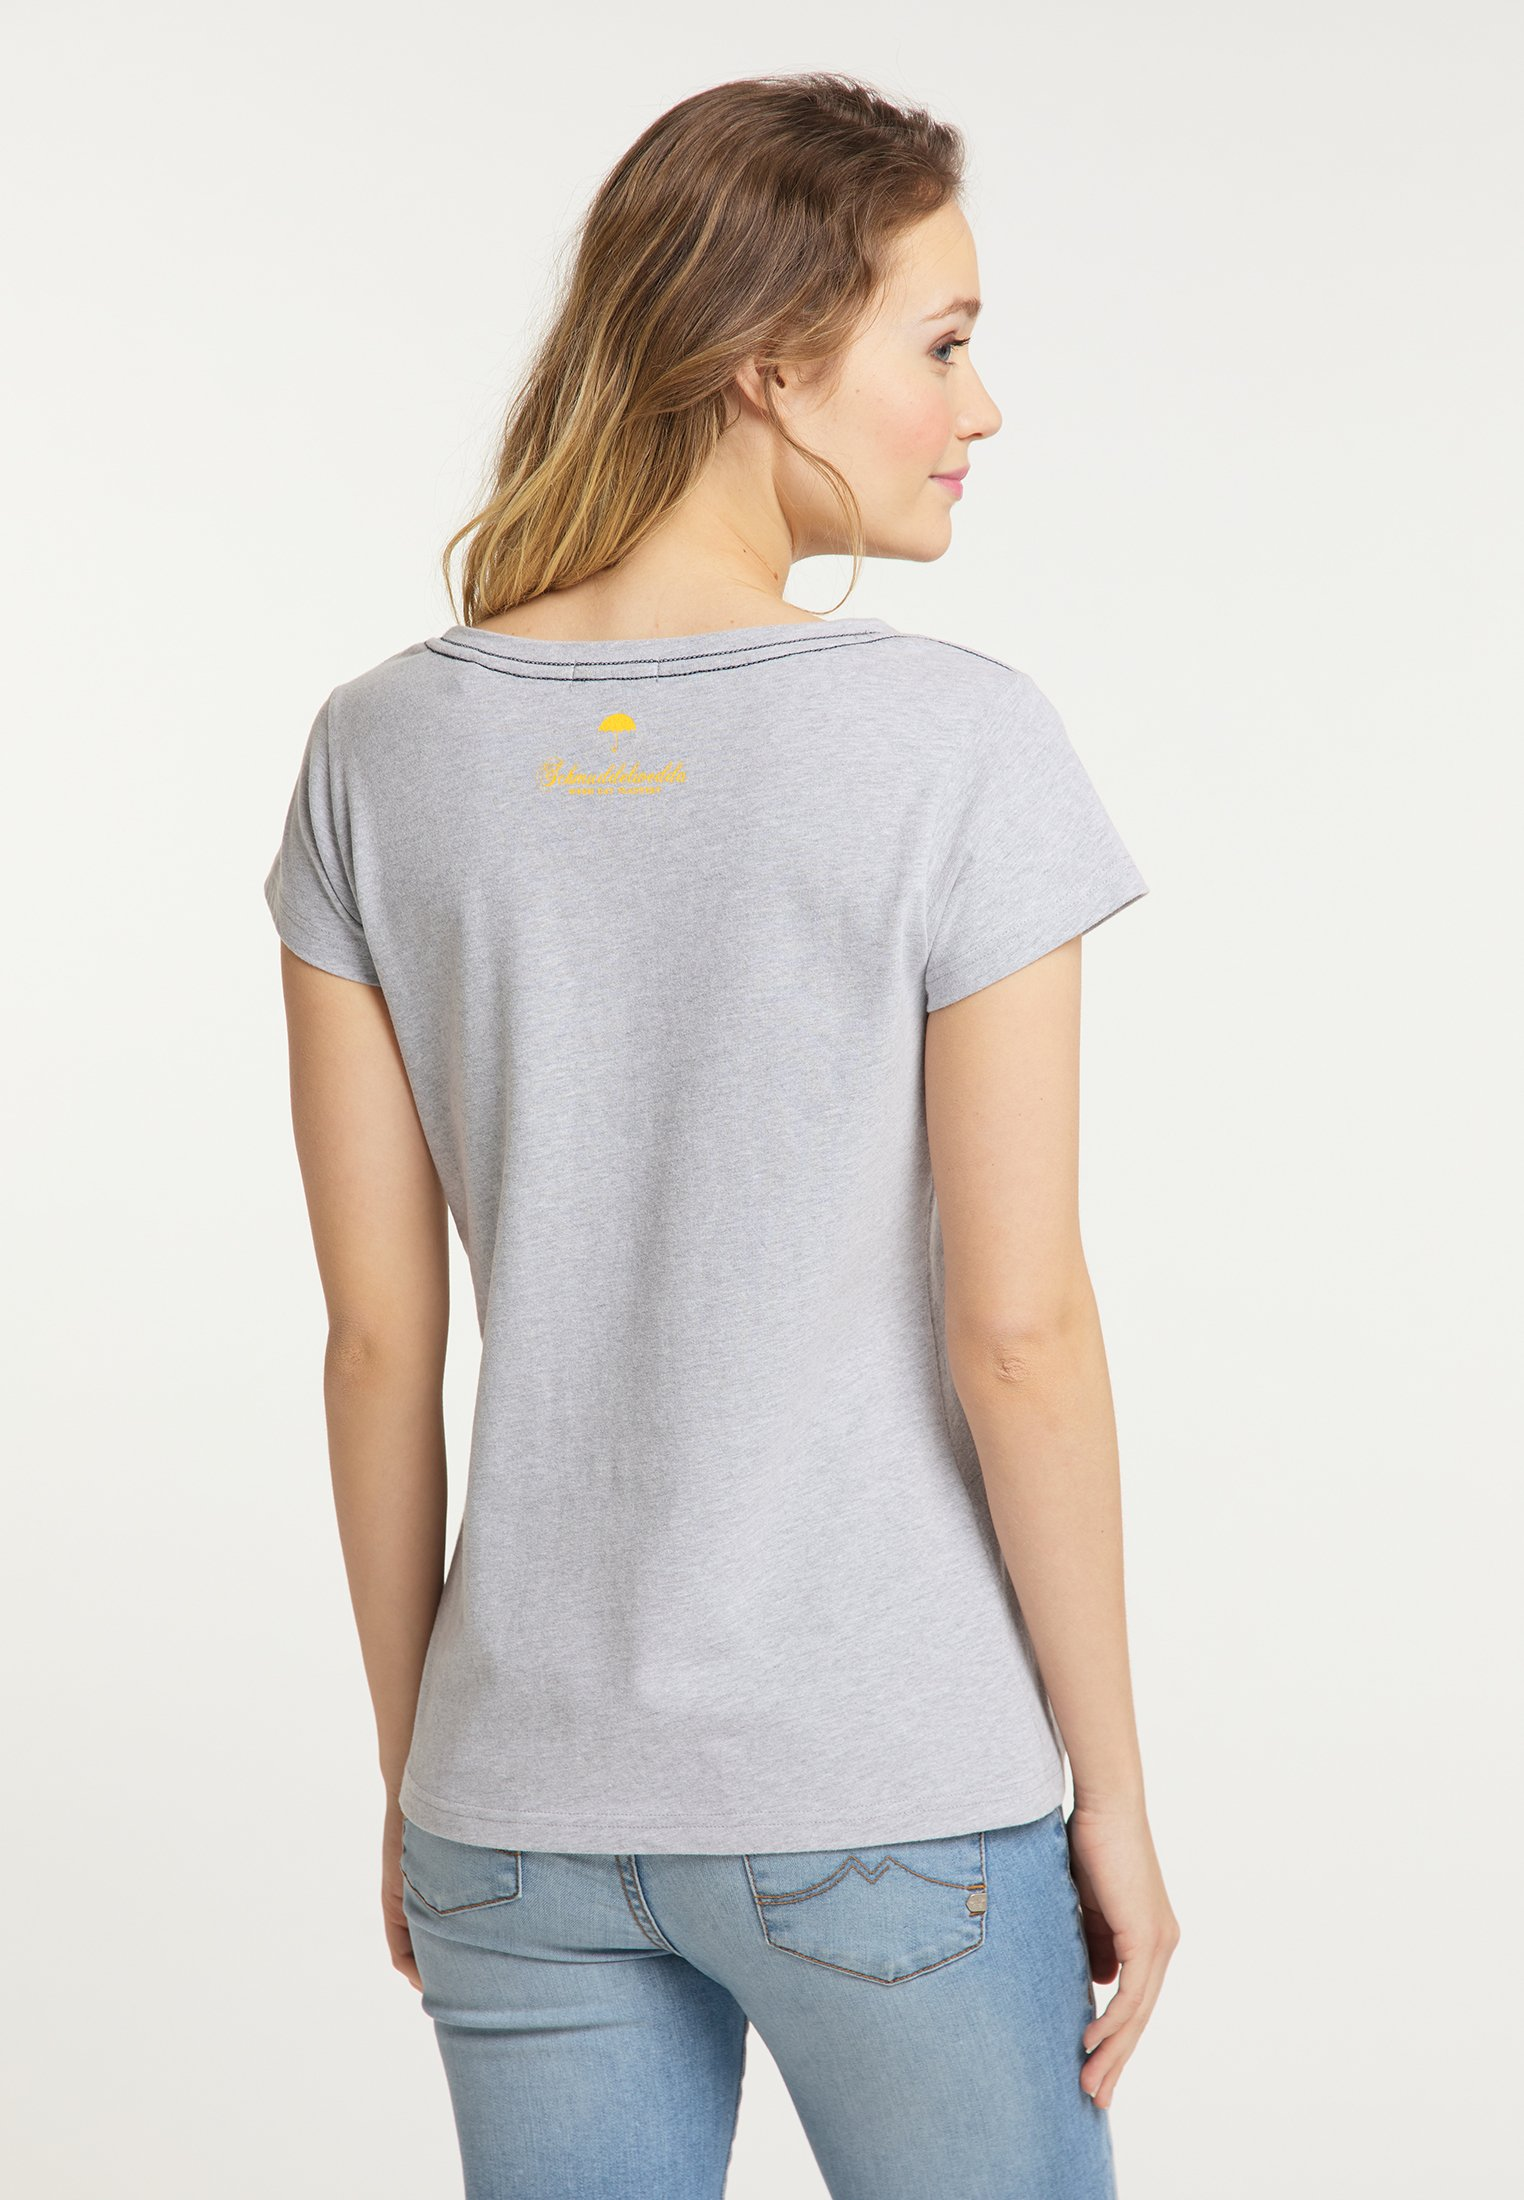 Schmuddelwedda T-shirt z nadrukiem - light grey melange